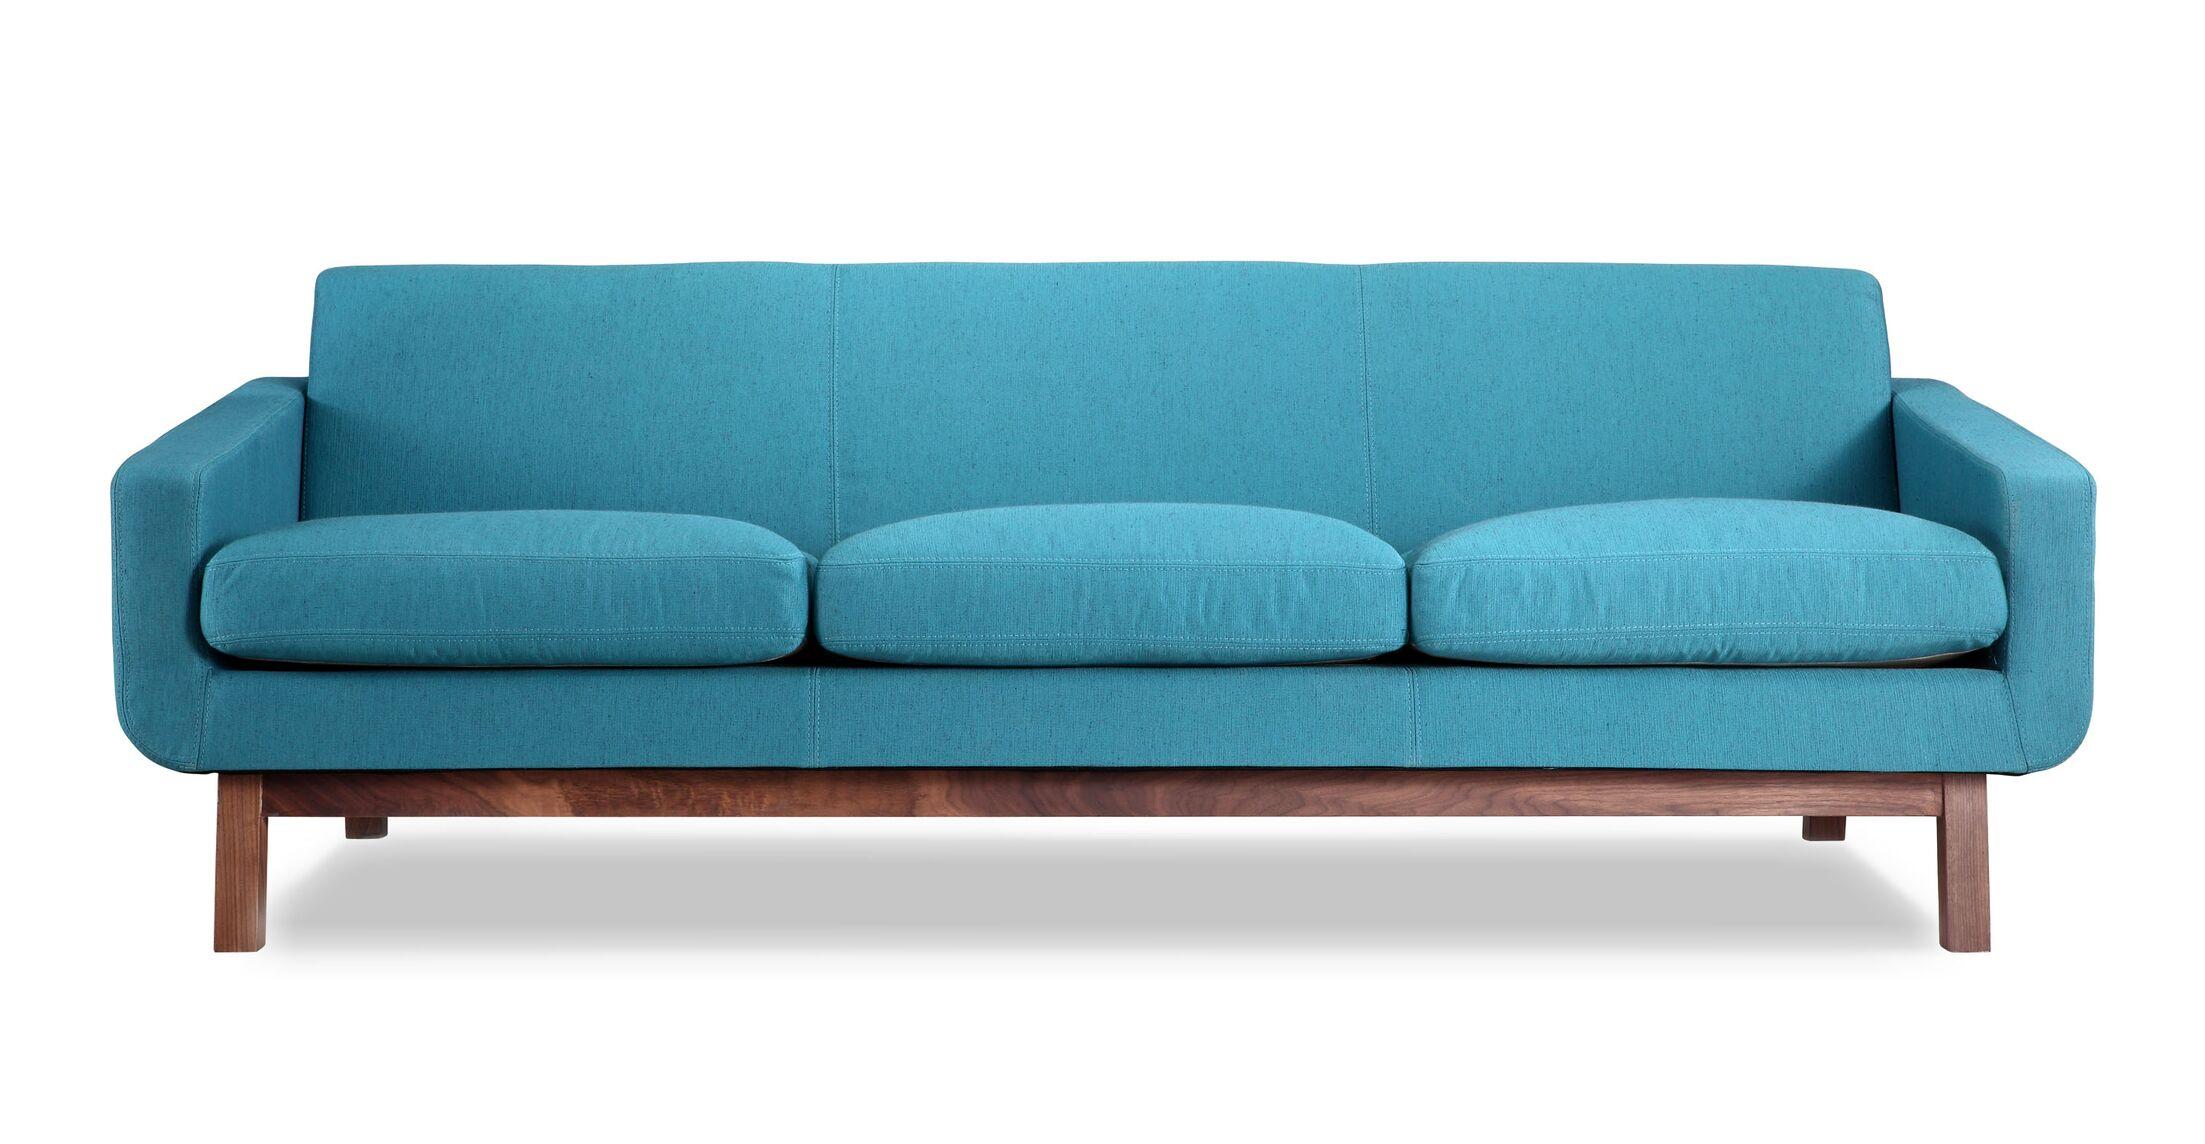 Stuart Mid Century Modern Classic Sofa Frame Finish: Walnut, Upholstery: Urban Surf